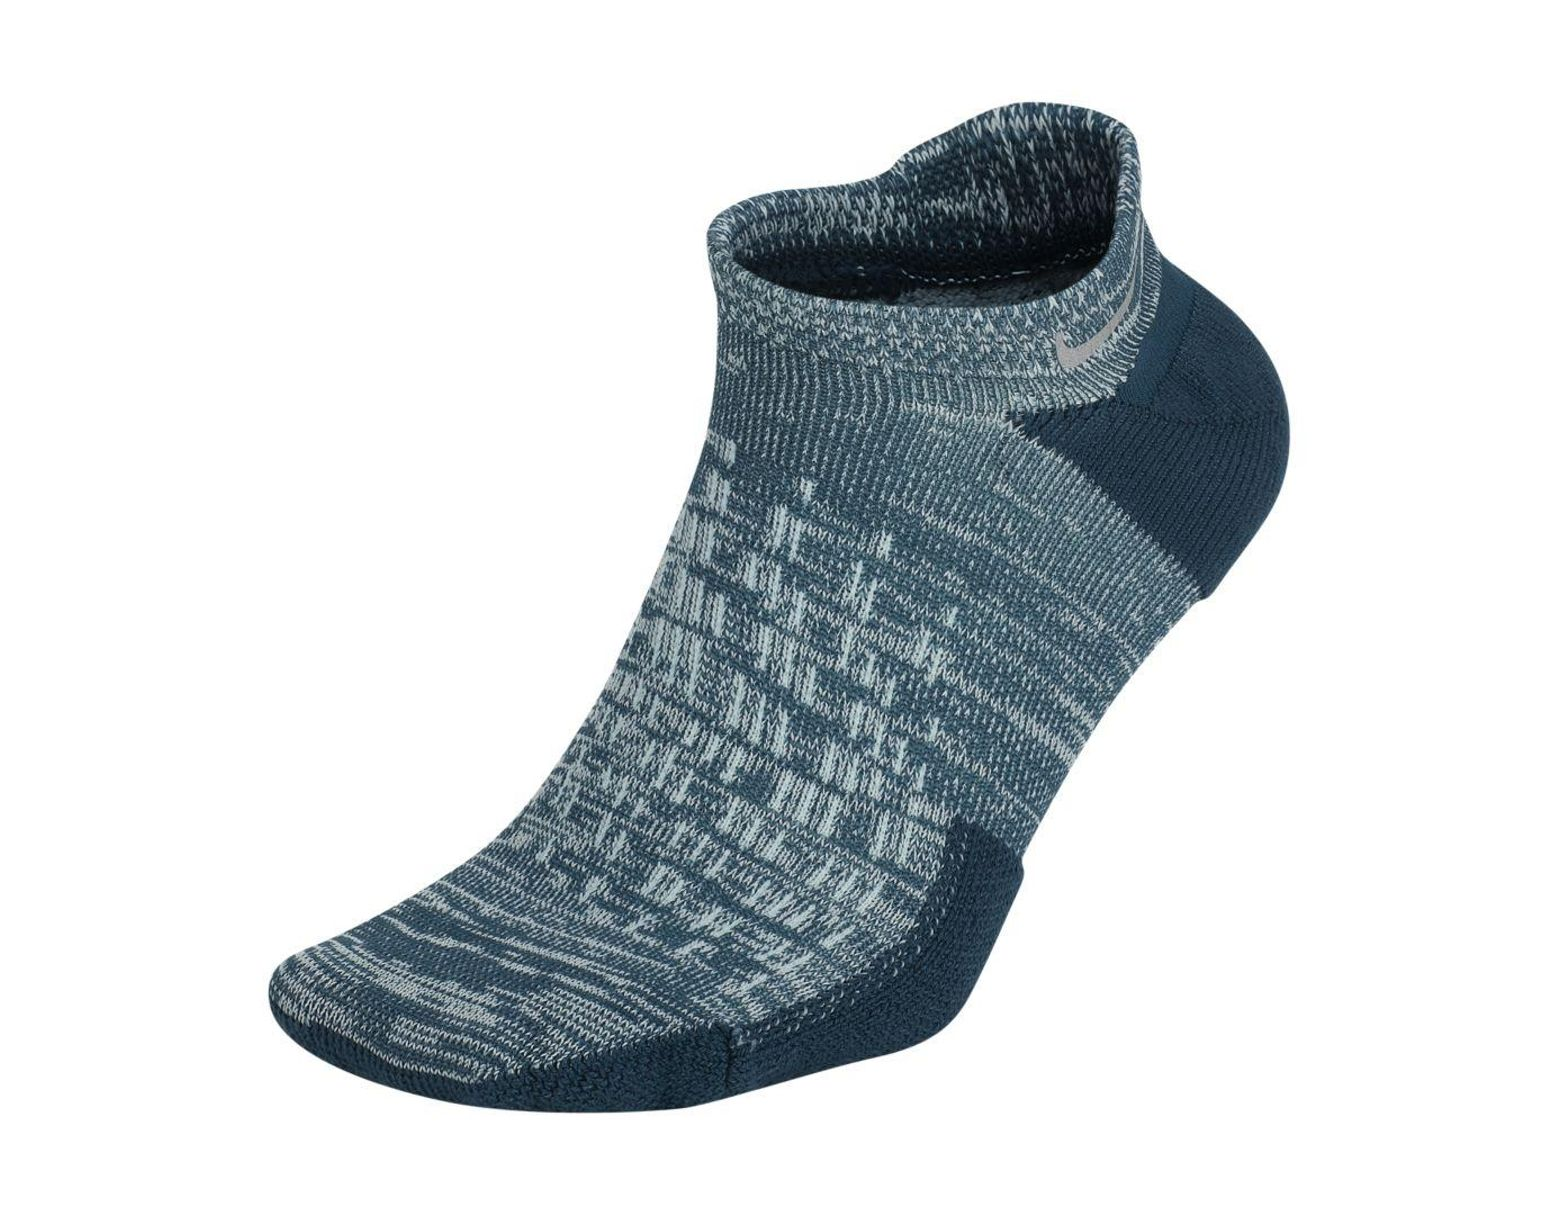 d989f7c88 Nike Elite Cushioned No-show Running Socks in Blue for Men - Lyst